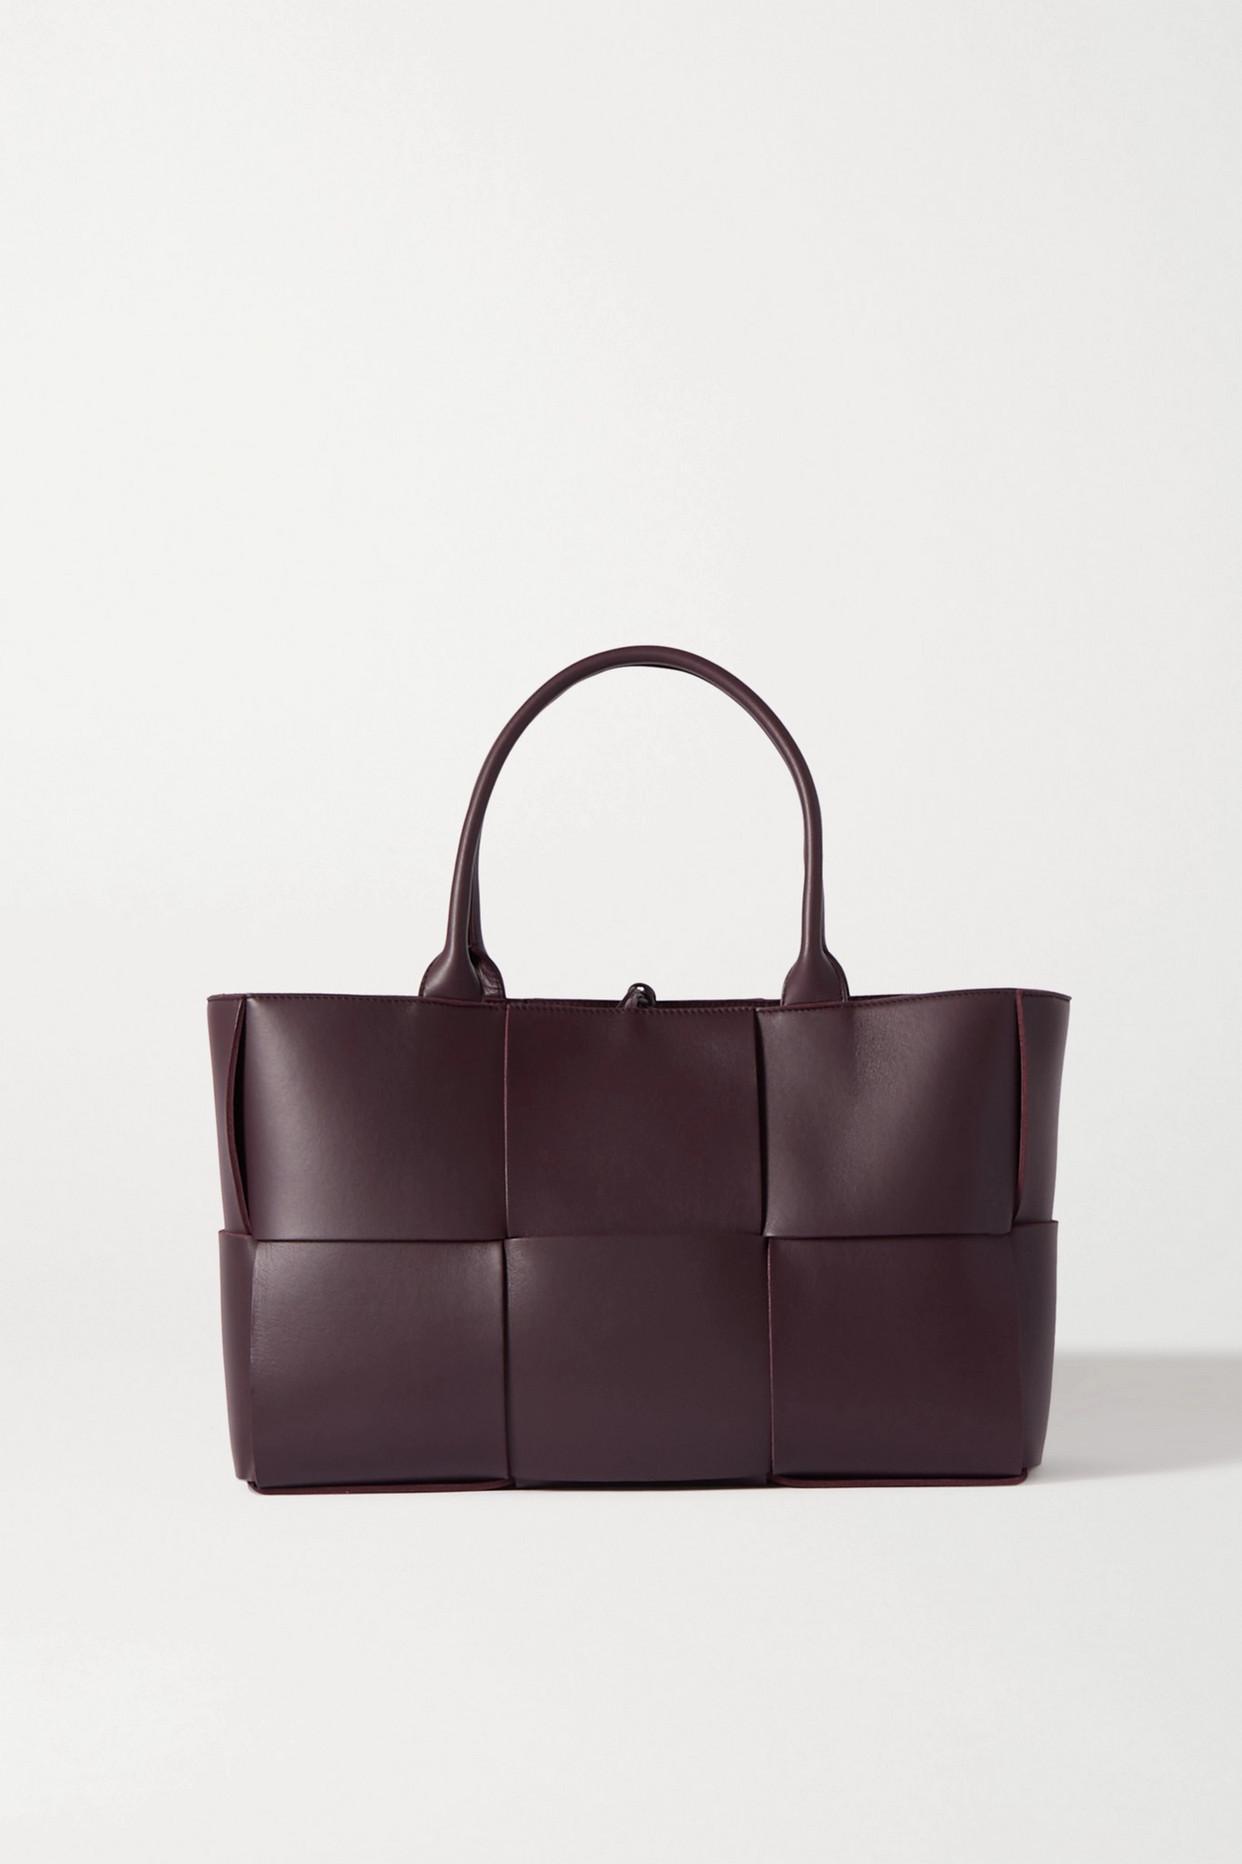 BOTTEGA VENETA - Arco Medium Intrecciato Leather Tote - Purple - one size